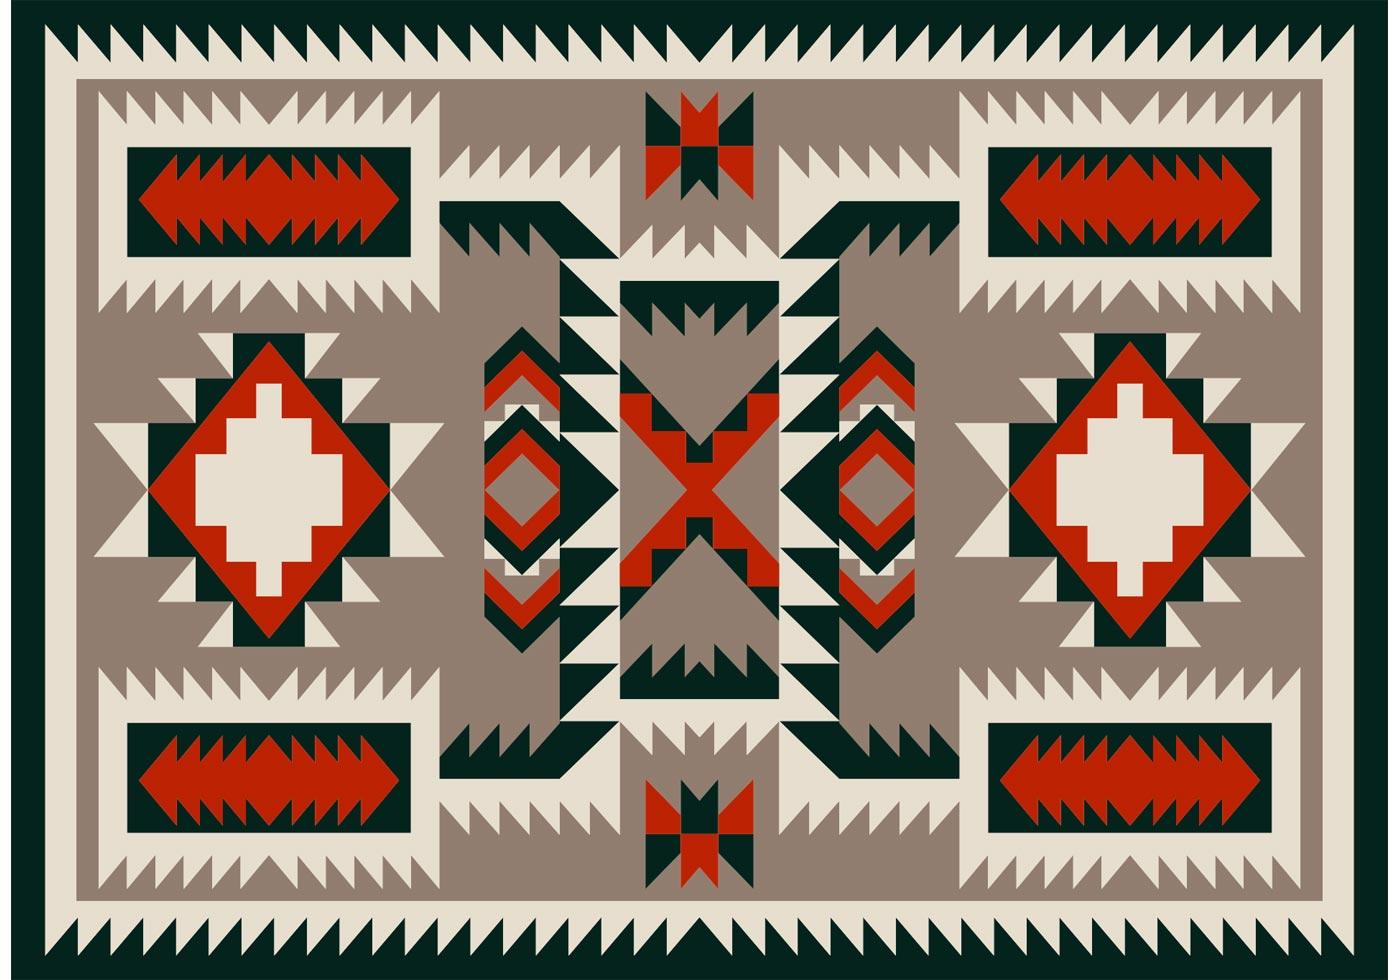 Navajo designs Small Vecteezy Navajo Free Vector Art 4236 Free Downloads